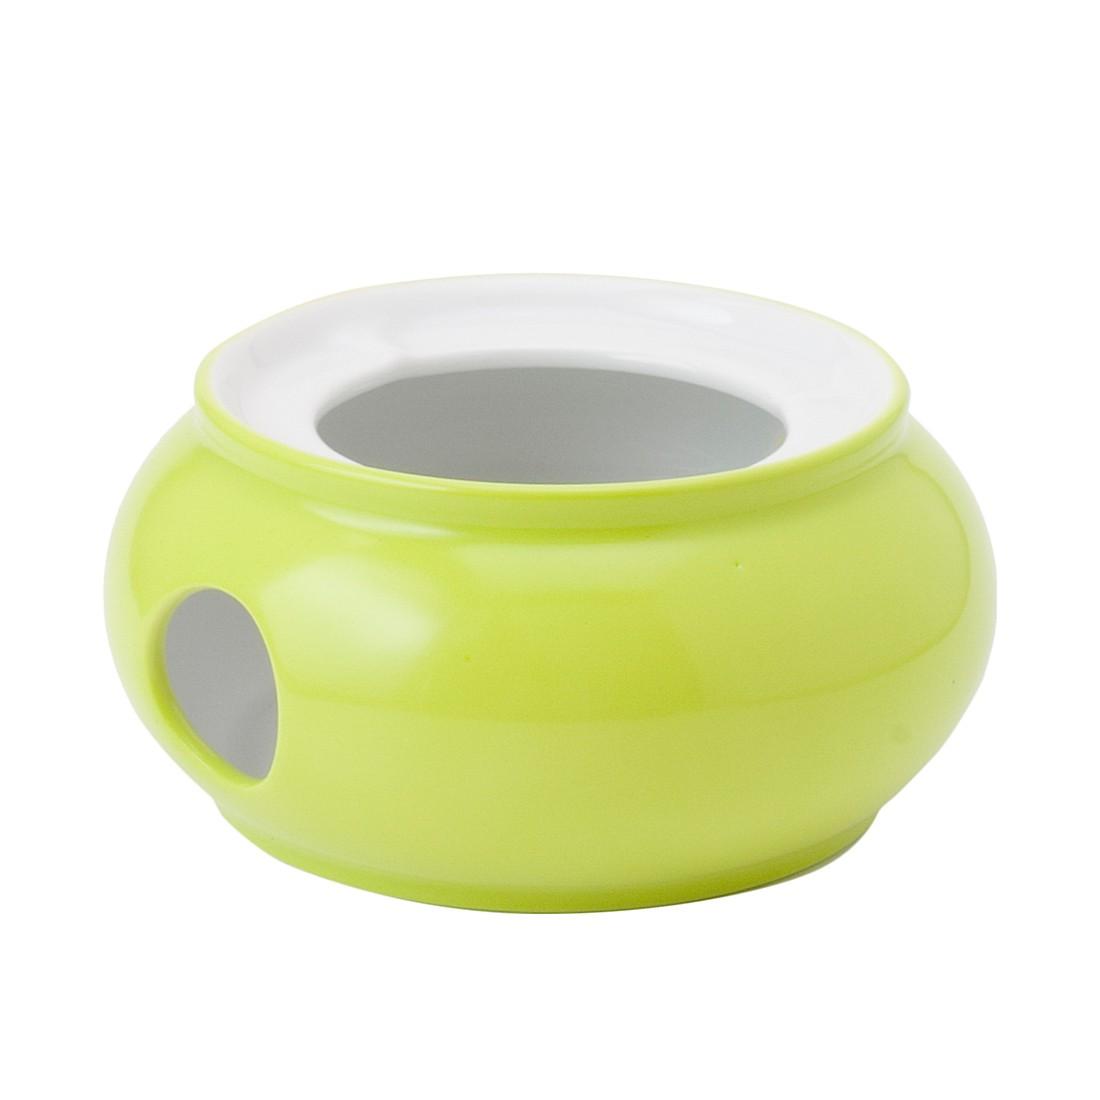 Stövchen Pronto – Limone, Kahla jetzt kaufen